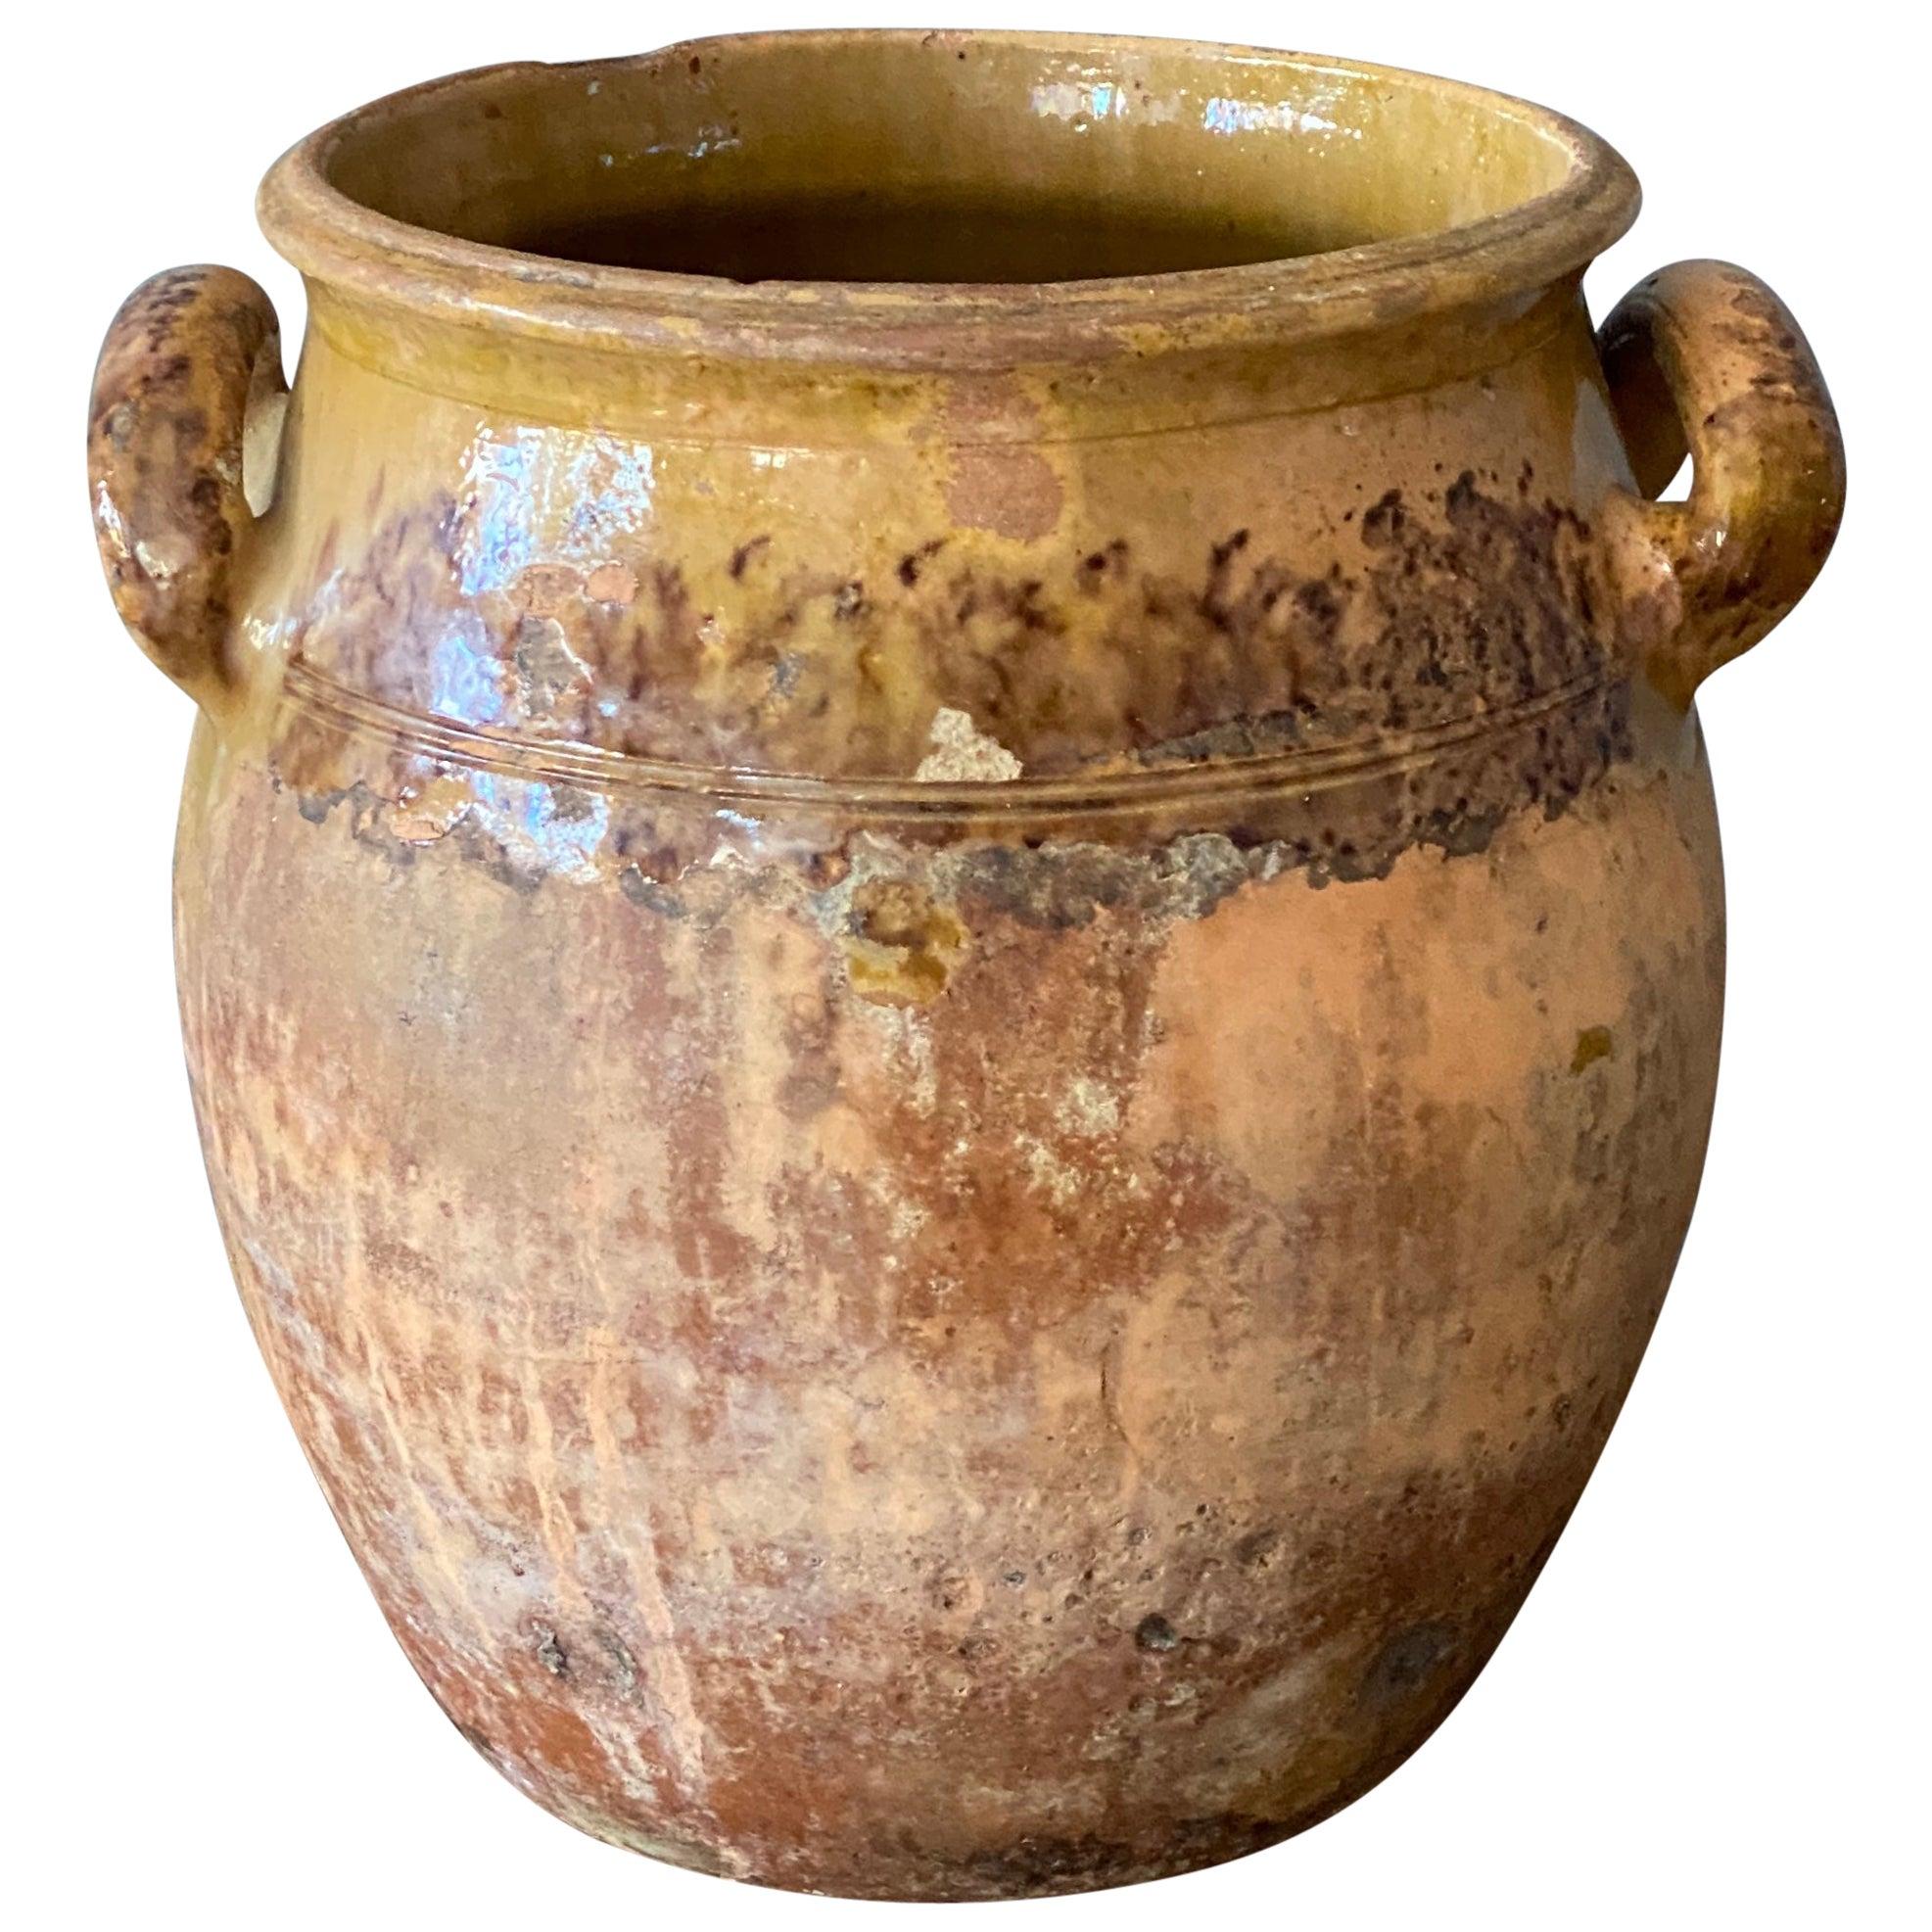 Swedish Folk Art Pottery, Unique 19th Century Pottery Farmers Vase Vessel